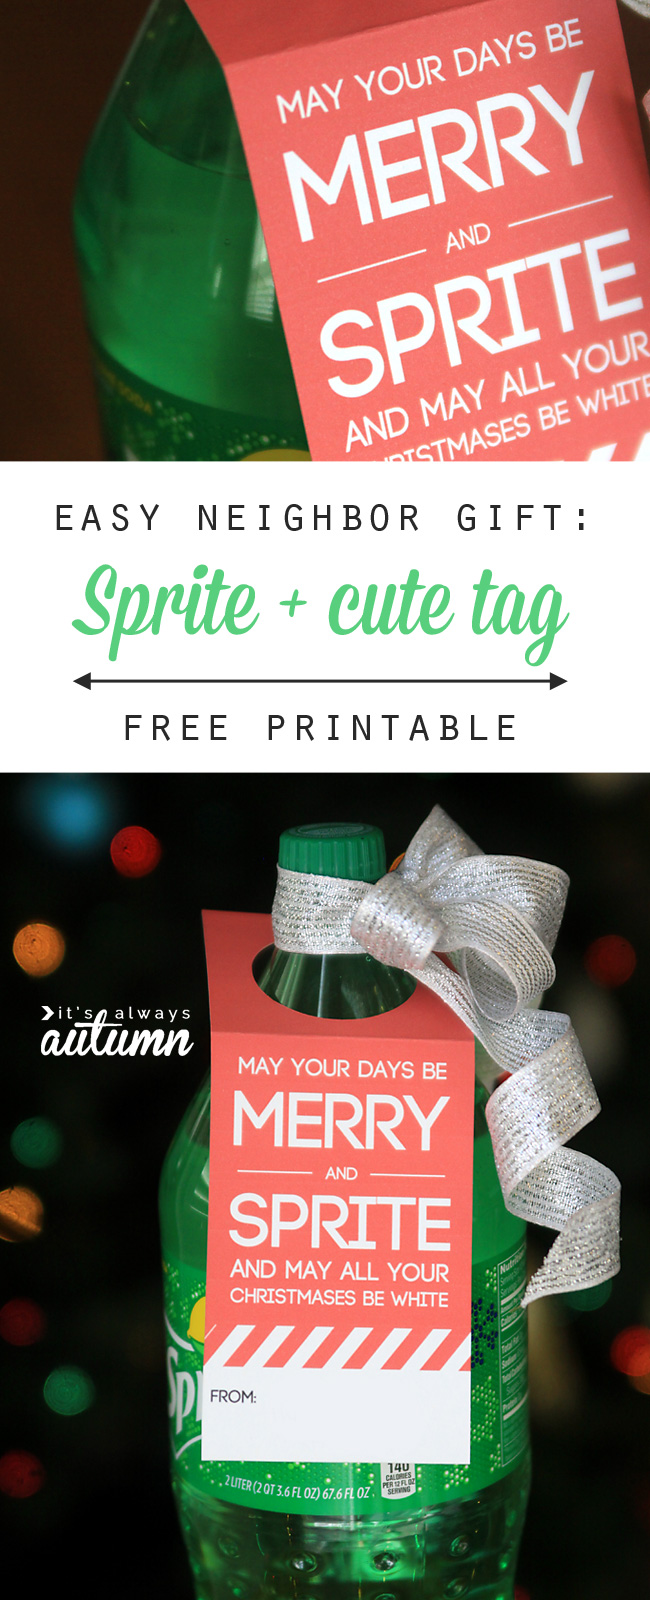 Sprite neighbor gift with printable tag